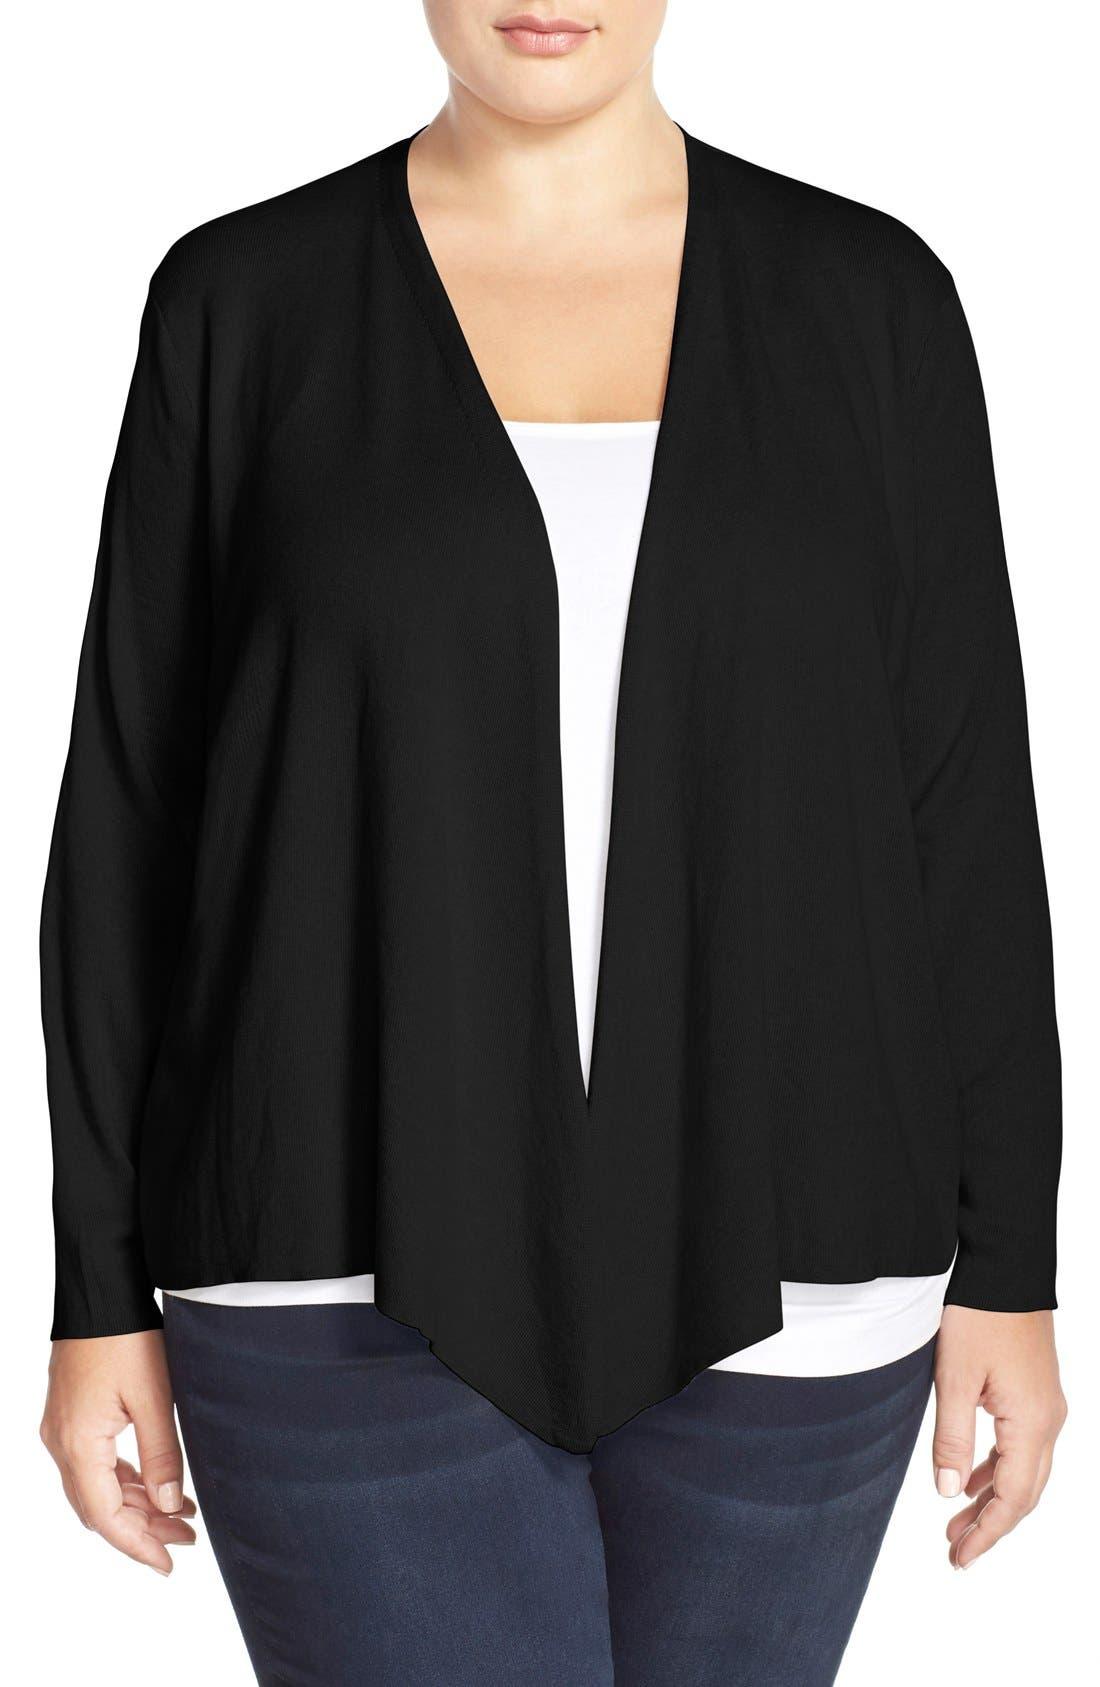 4-Way Convertible Cardigan,                         Main,                         color, Black Onyx